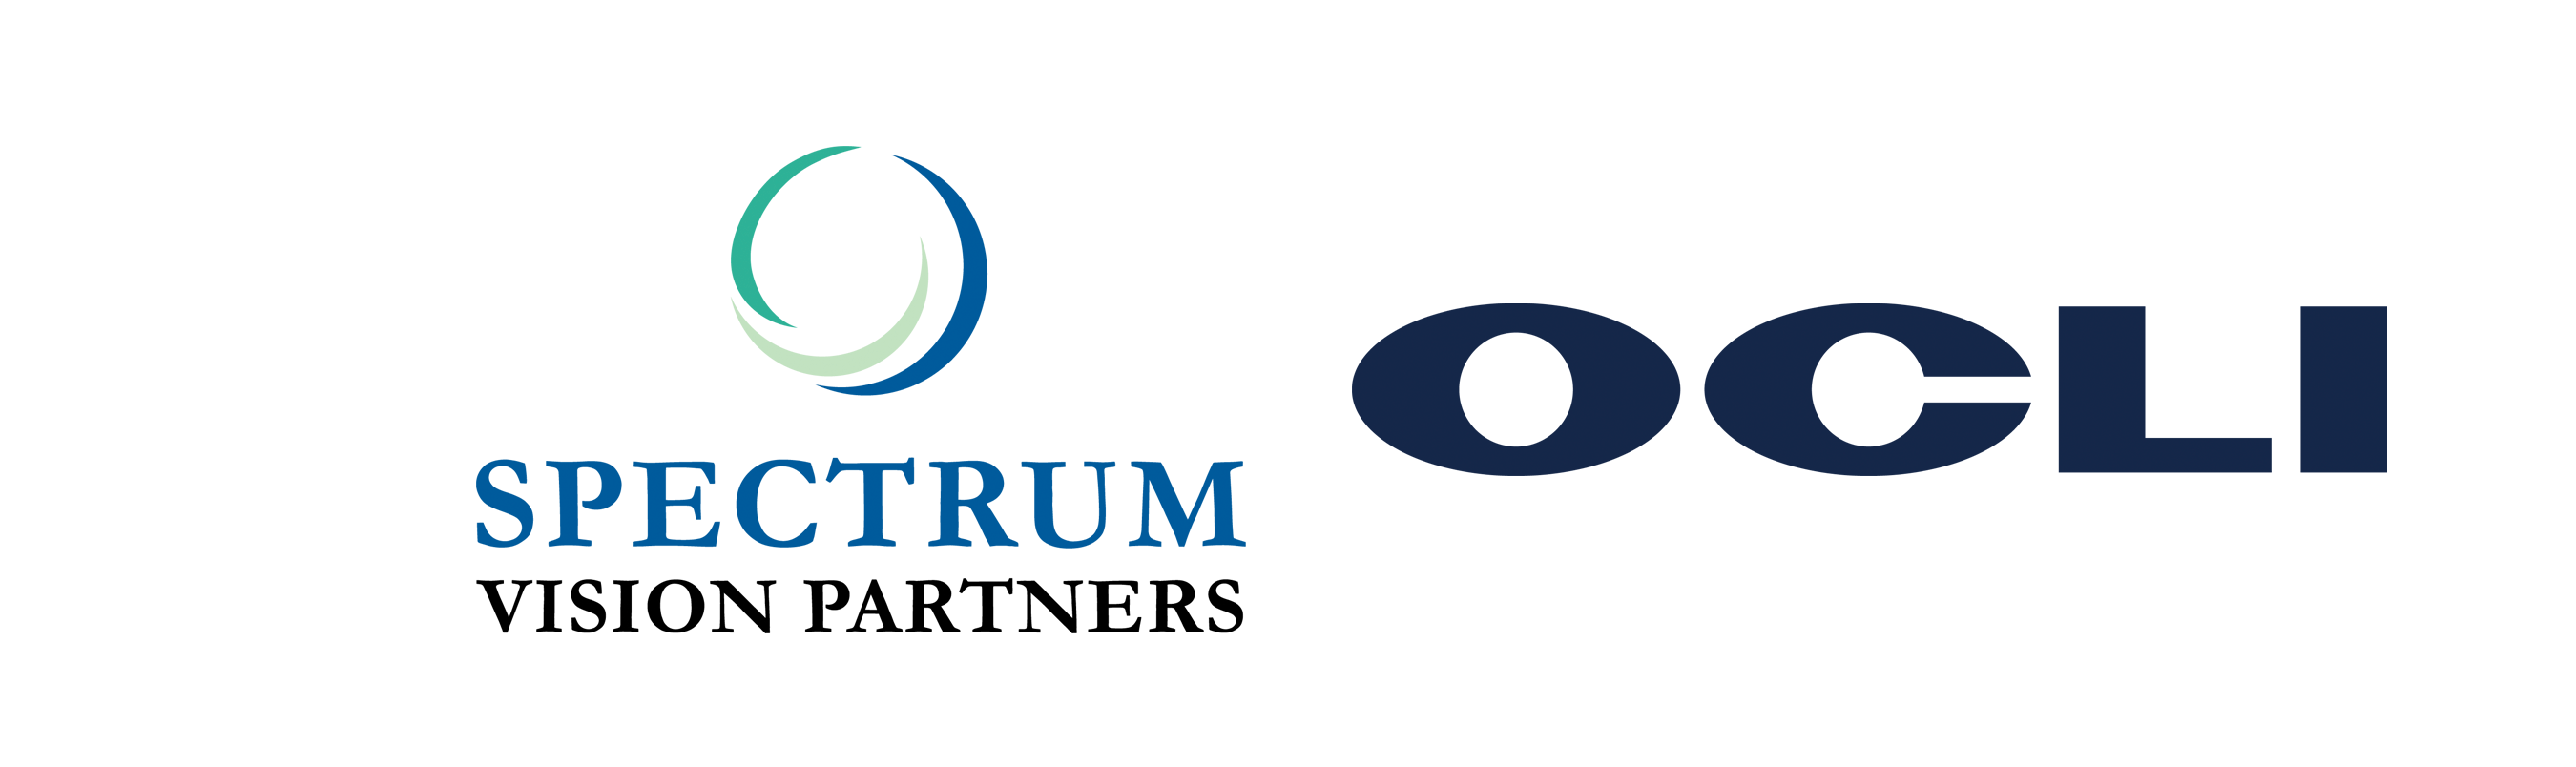 Spectrum Vision Partners logo